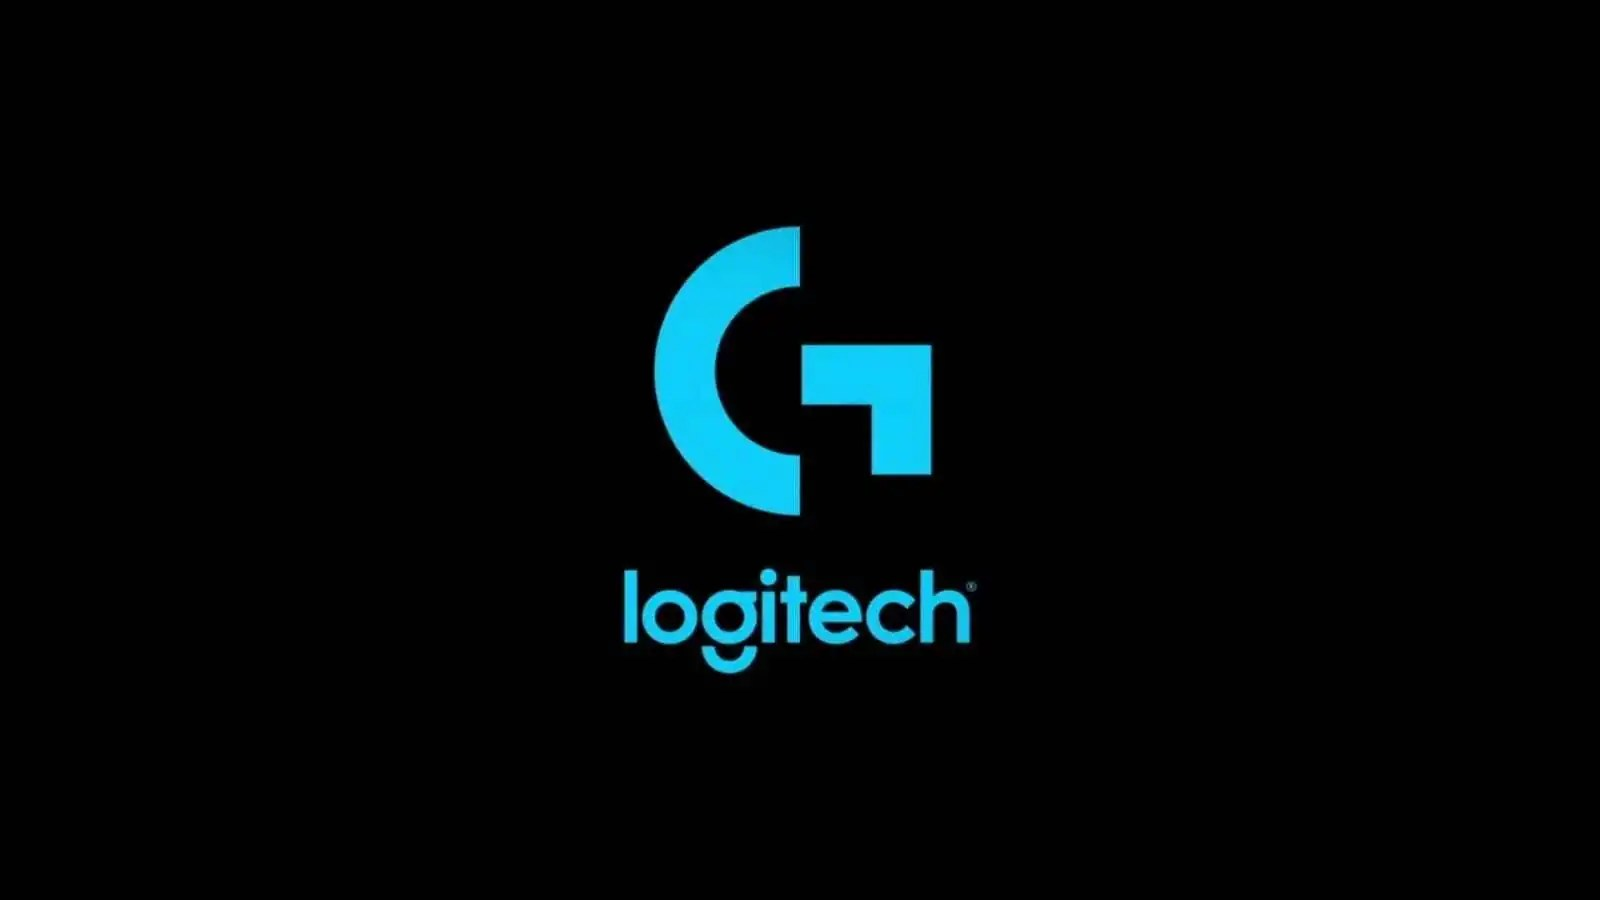 3d Action Wallpaper Hd Logo Logitech G Brandsit Pl